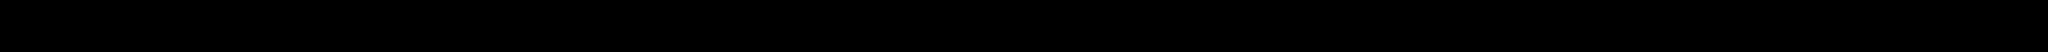 FEBI BILSTEIN 119 200 09 70, 119 200 14 70, A119 200 09 70, A119 200 14 70 Napinaci kladka, zebrovany klinovy remen